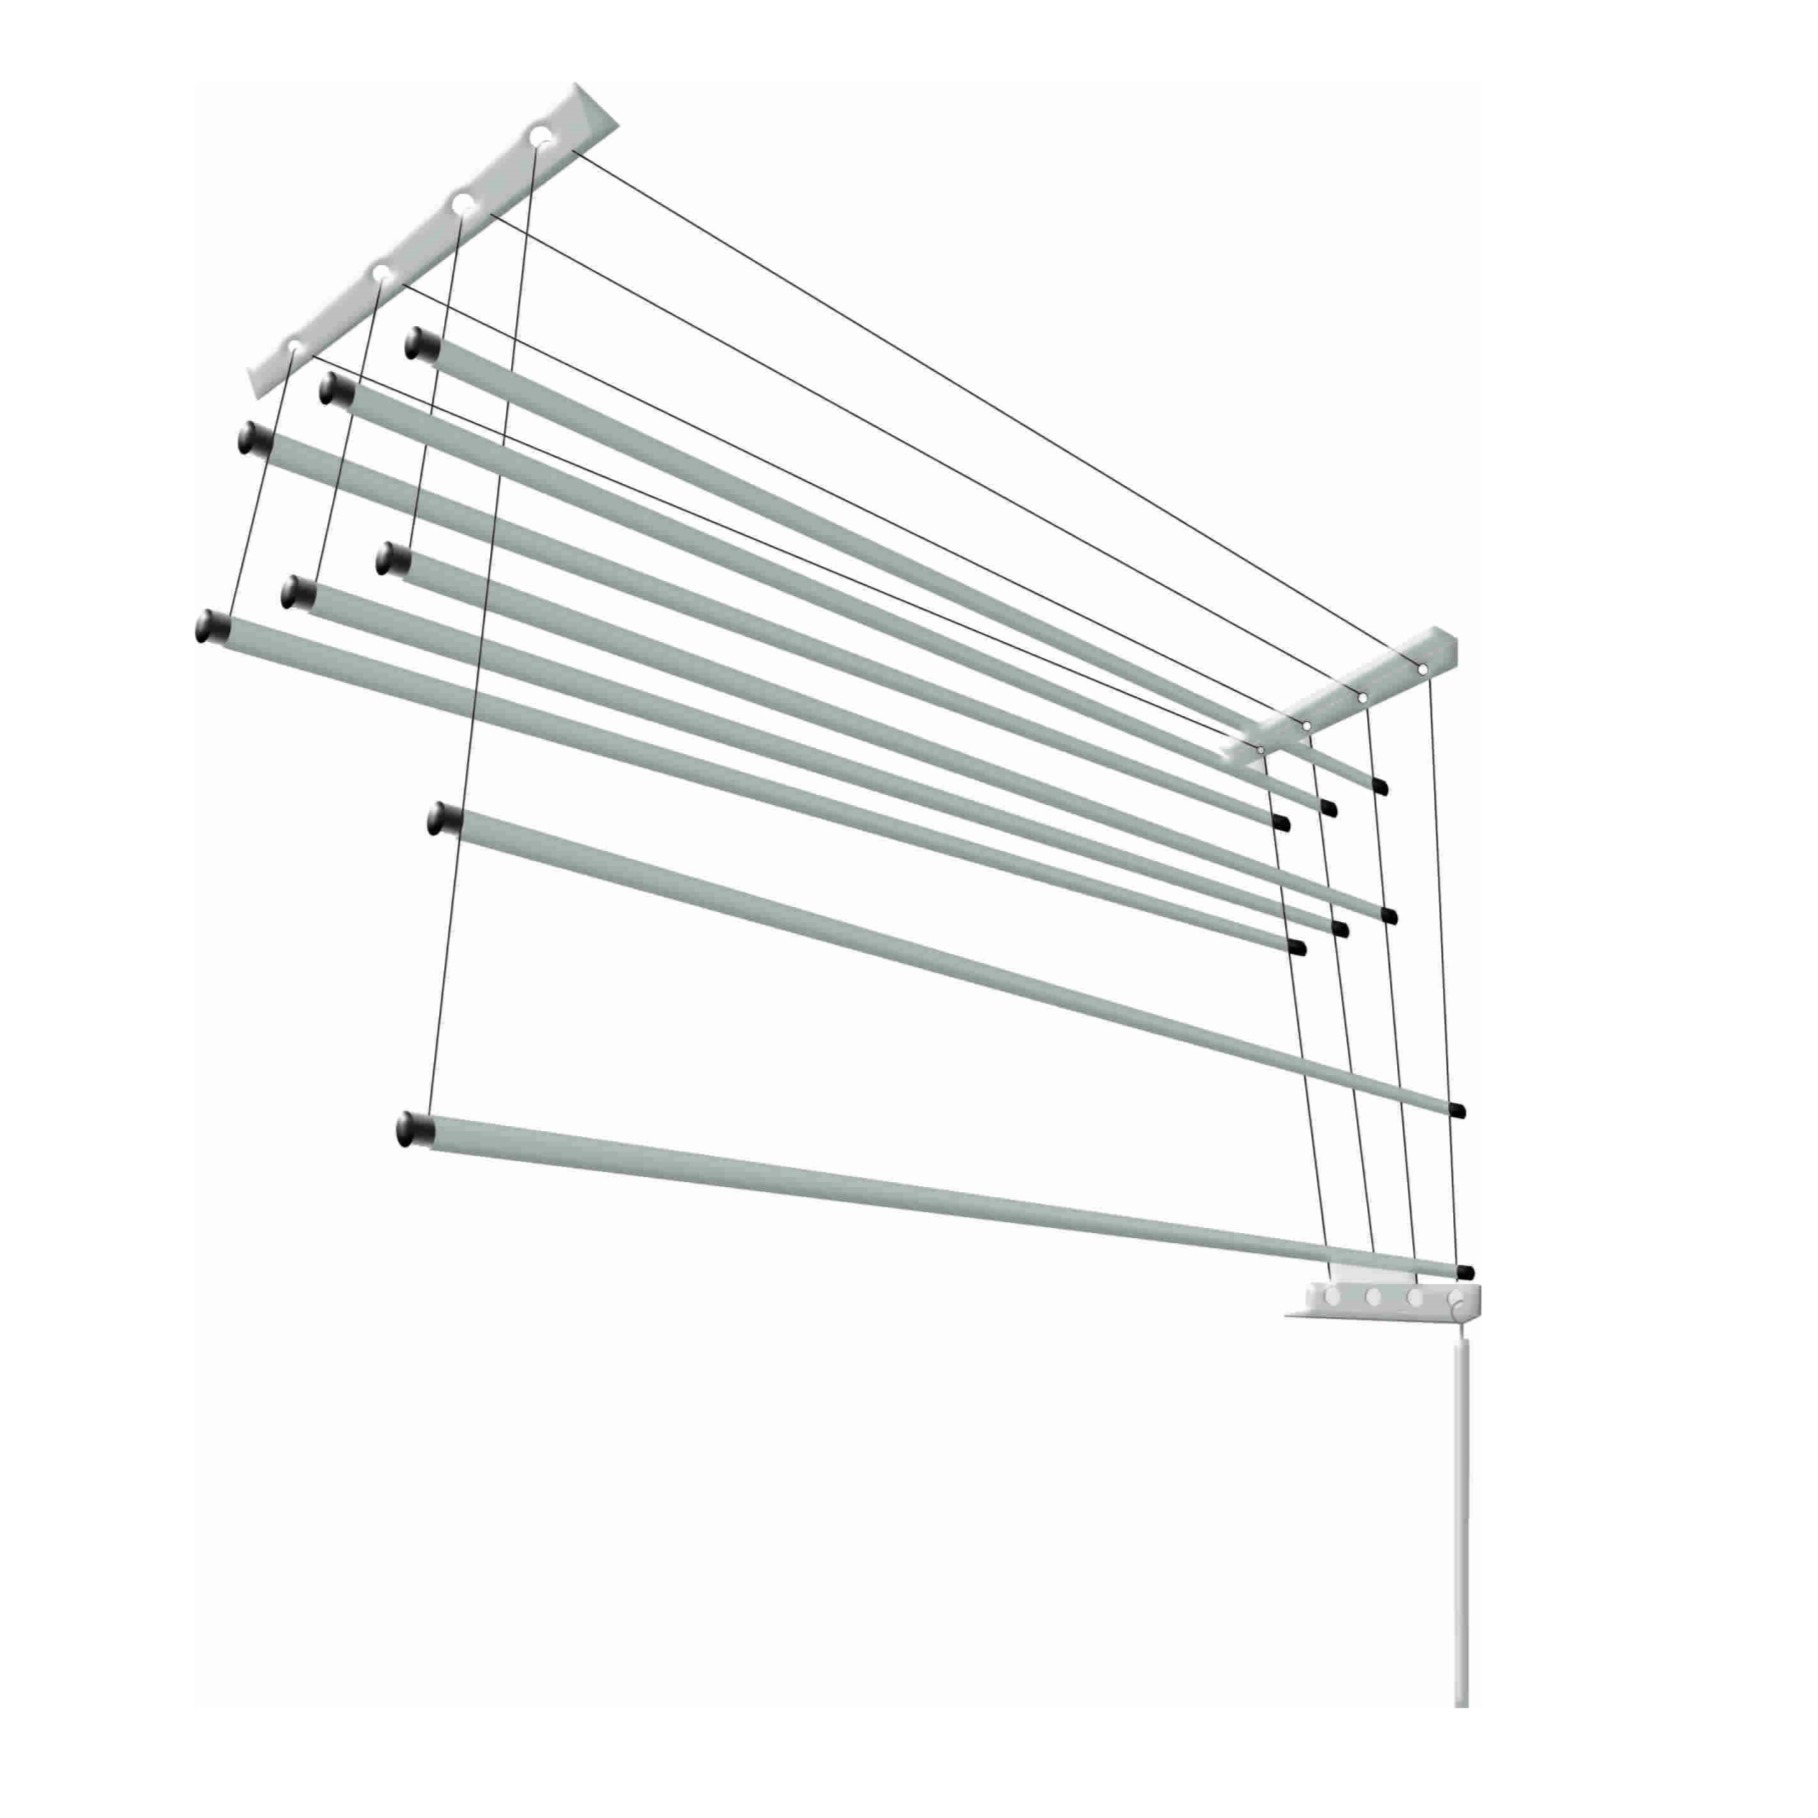 Varal de Teto Individual Duplo Aluminio 56X100cm VID1 - SoVarais